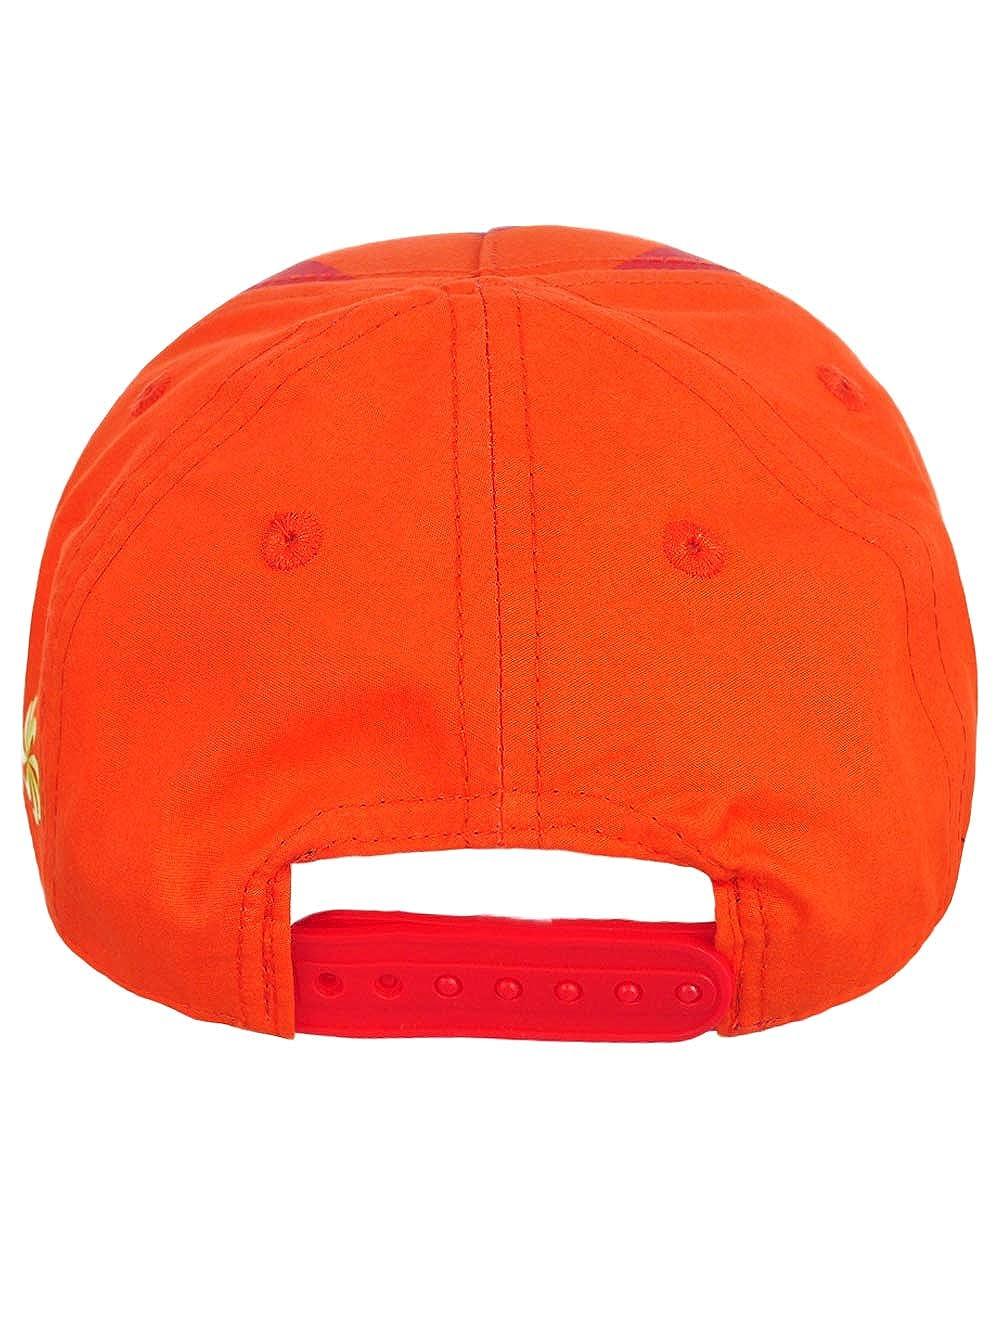 43ead3a72 Amazon.com: Nike Baby Boys' Snapback Cap (One Size) - max orange, 12 ...